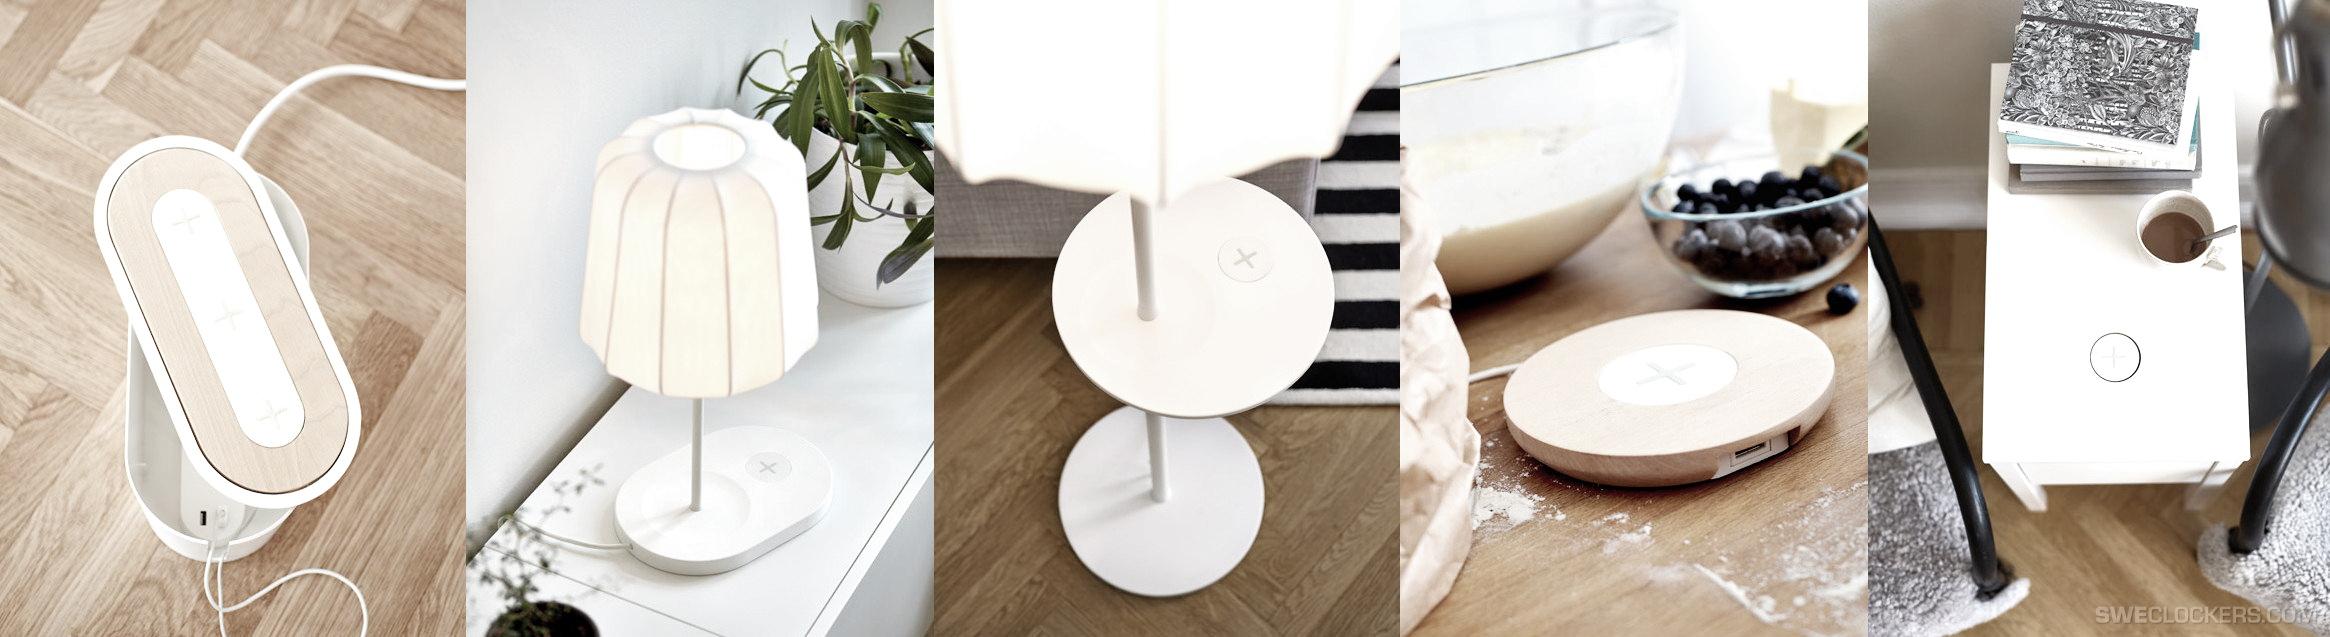 Ikea_qi_wireless-charging-products